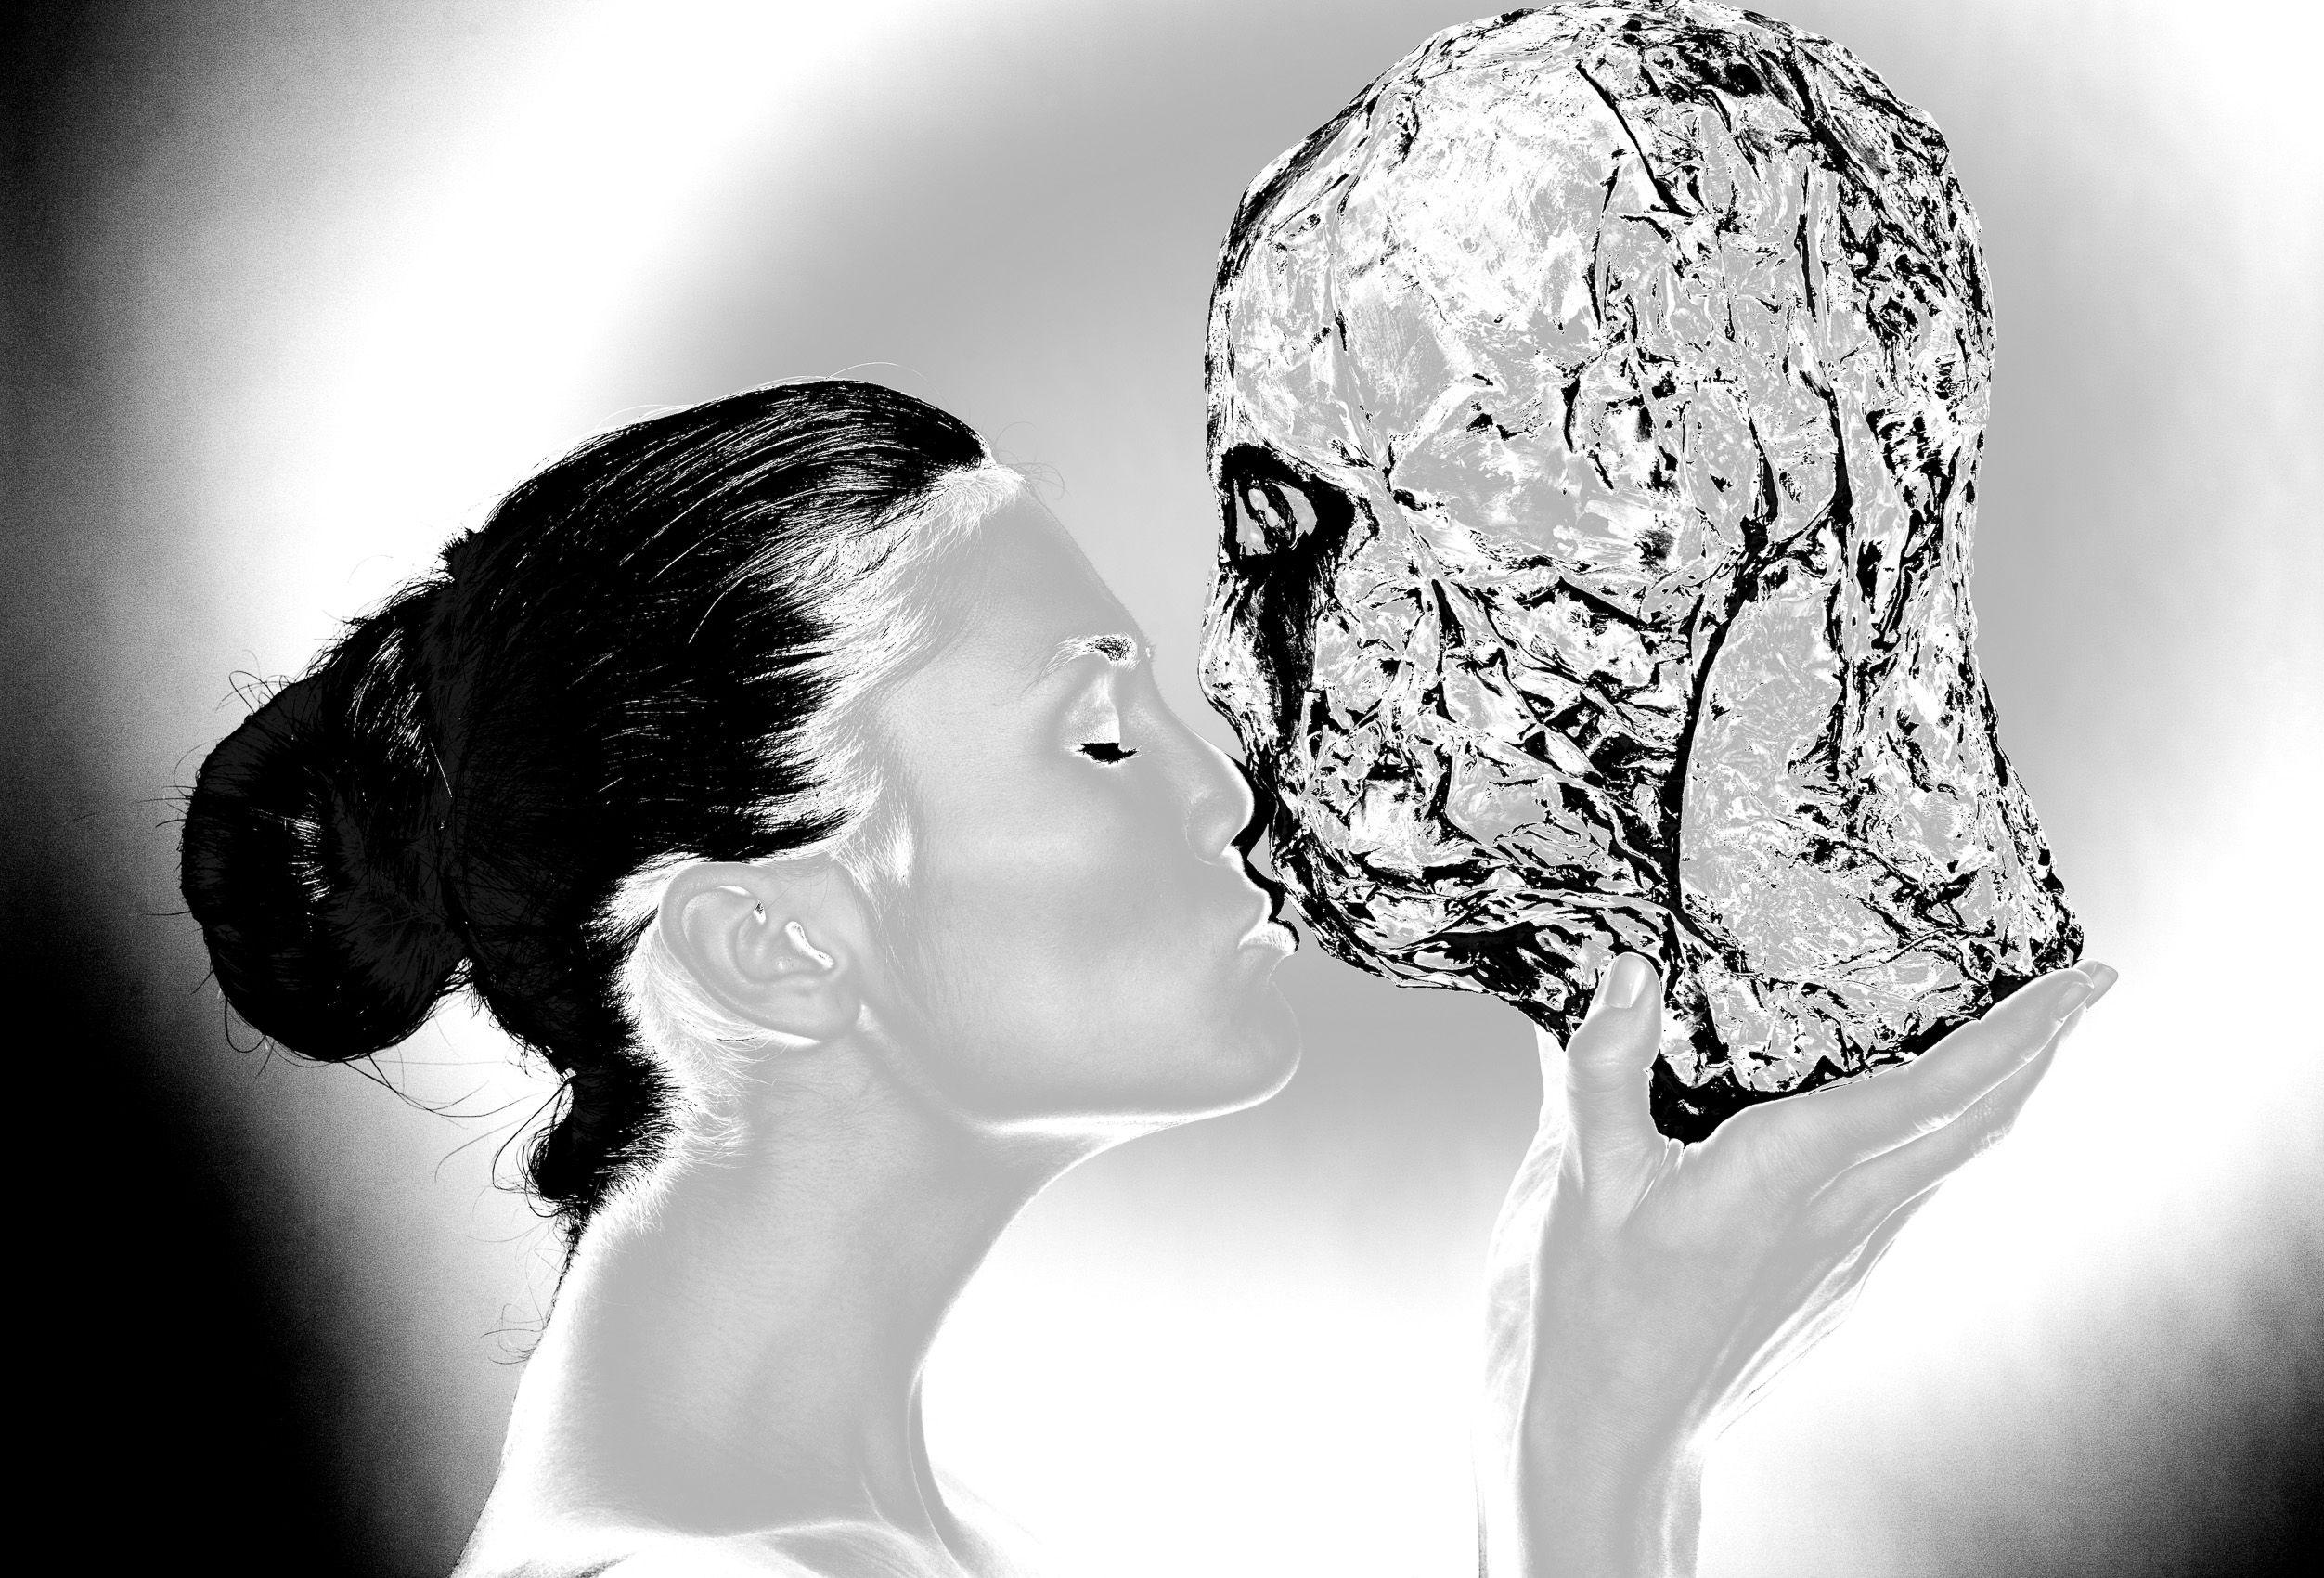 metal_human_08.jpg